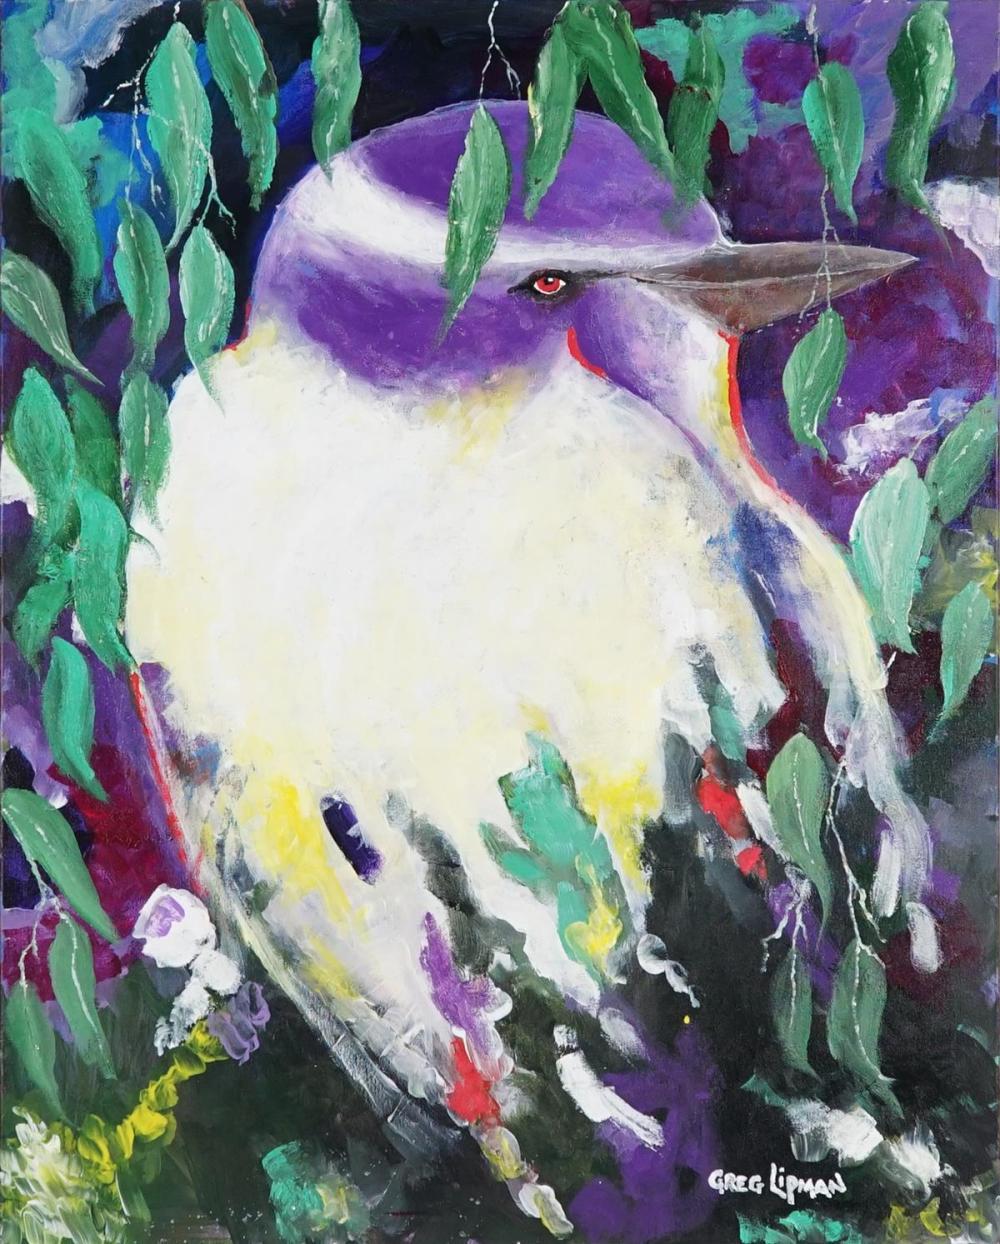 Greg Lipman (1938 - ) - L'amore 76 x 61cm